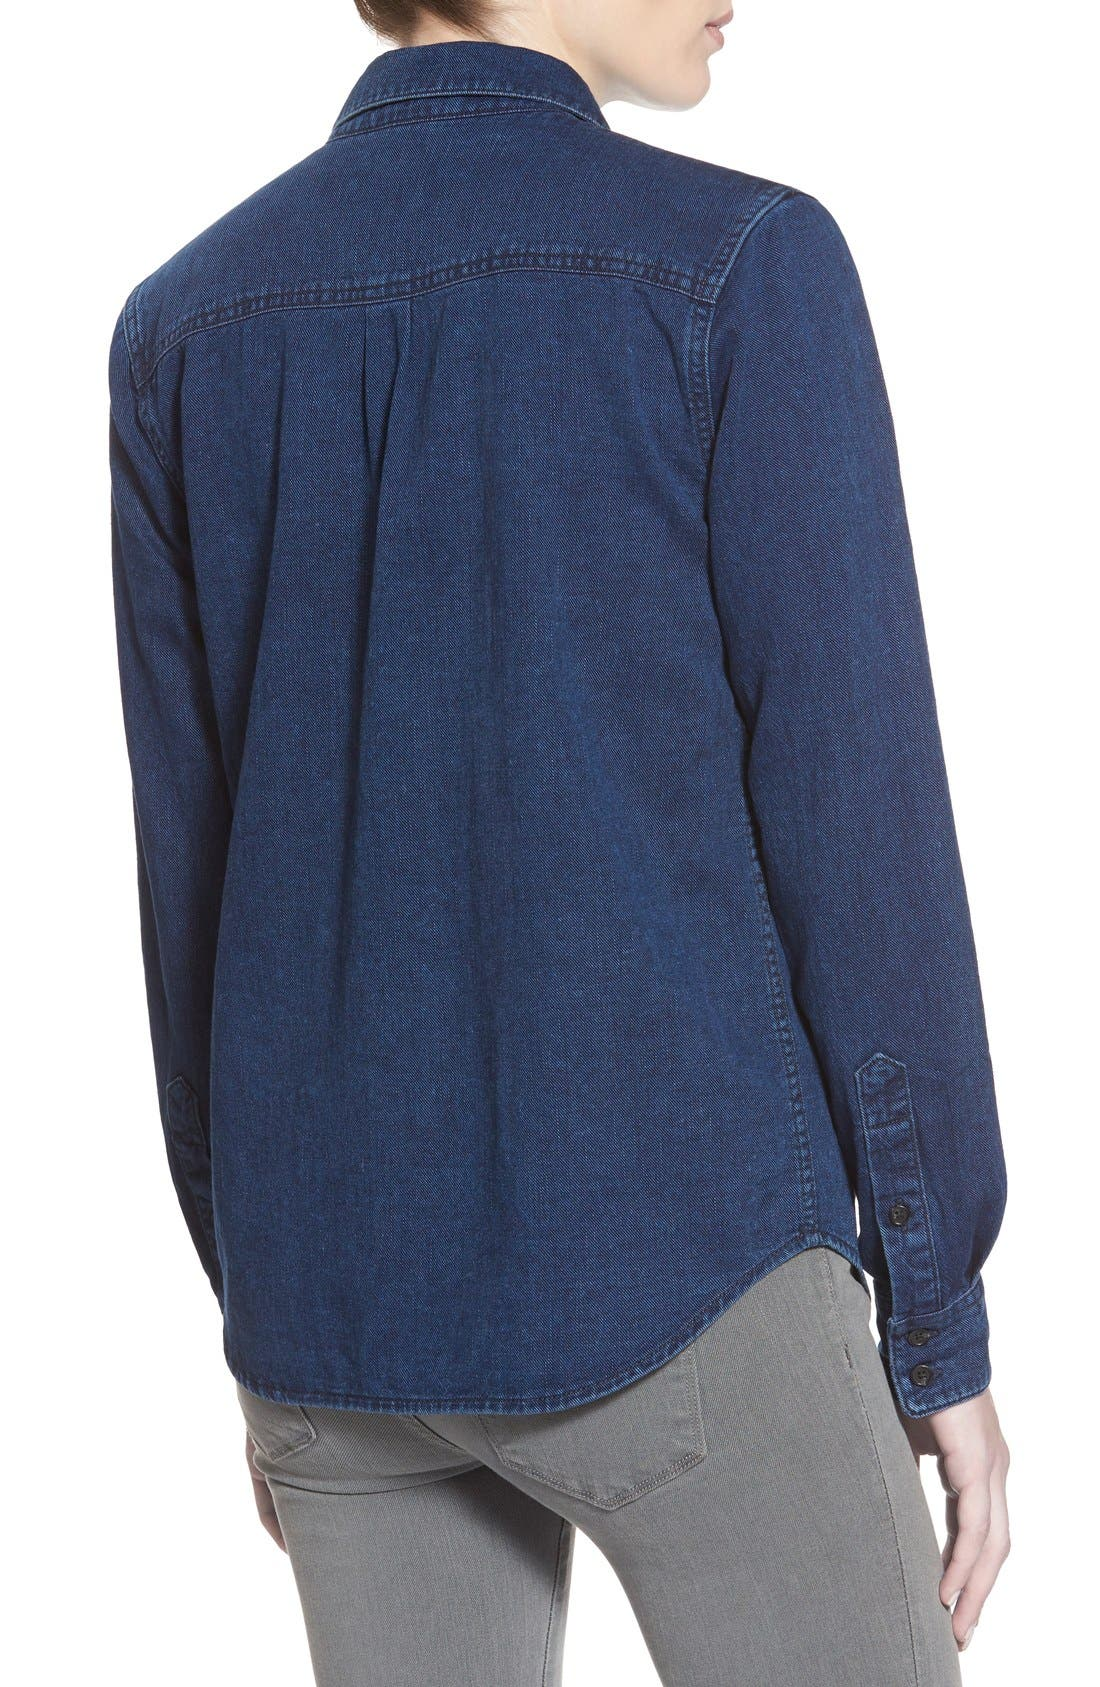 'Collector's - Leigh' Denim Shirt,                             Alternate thumbnail 2, color,                             Medium Wash